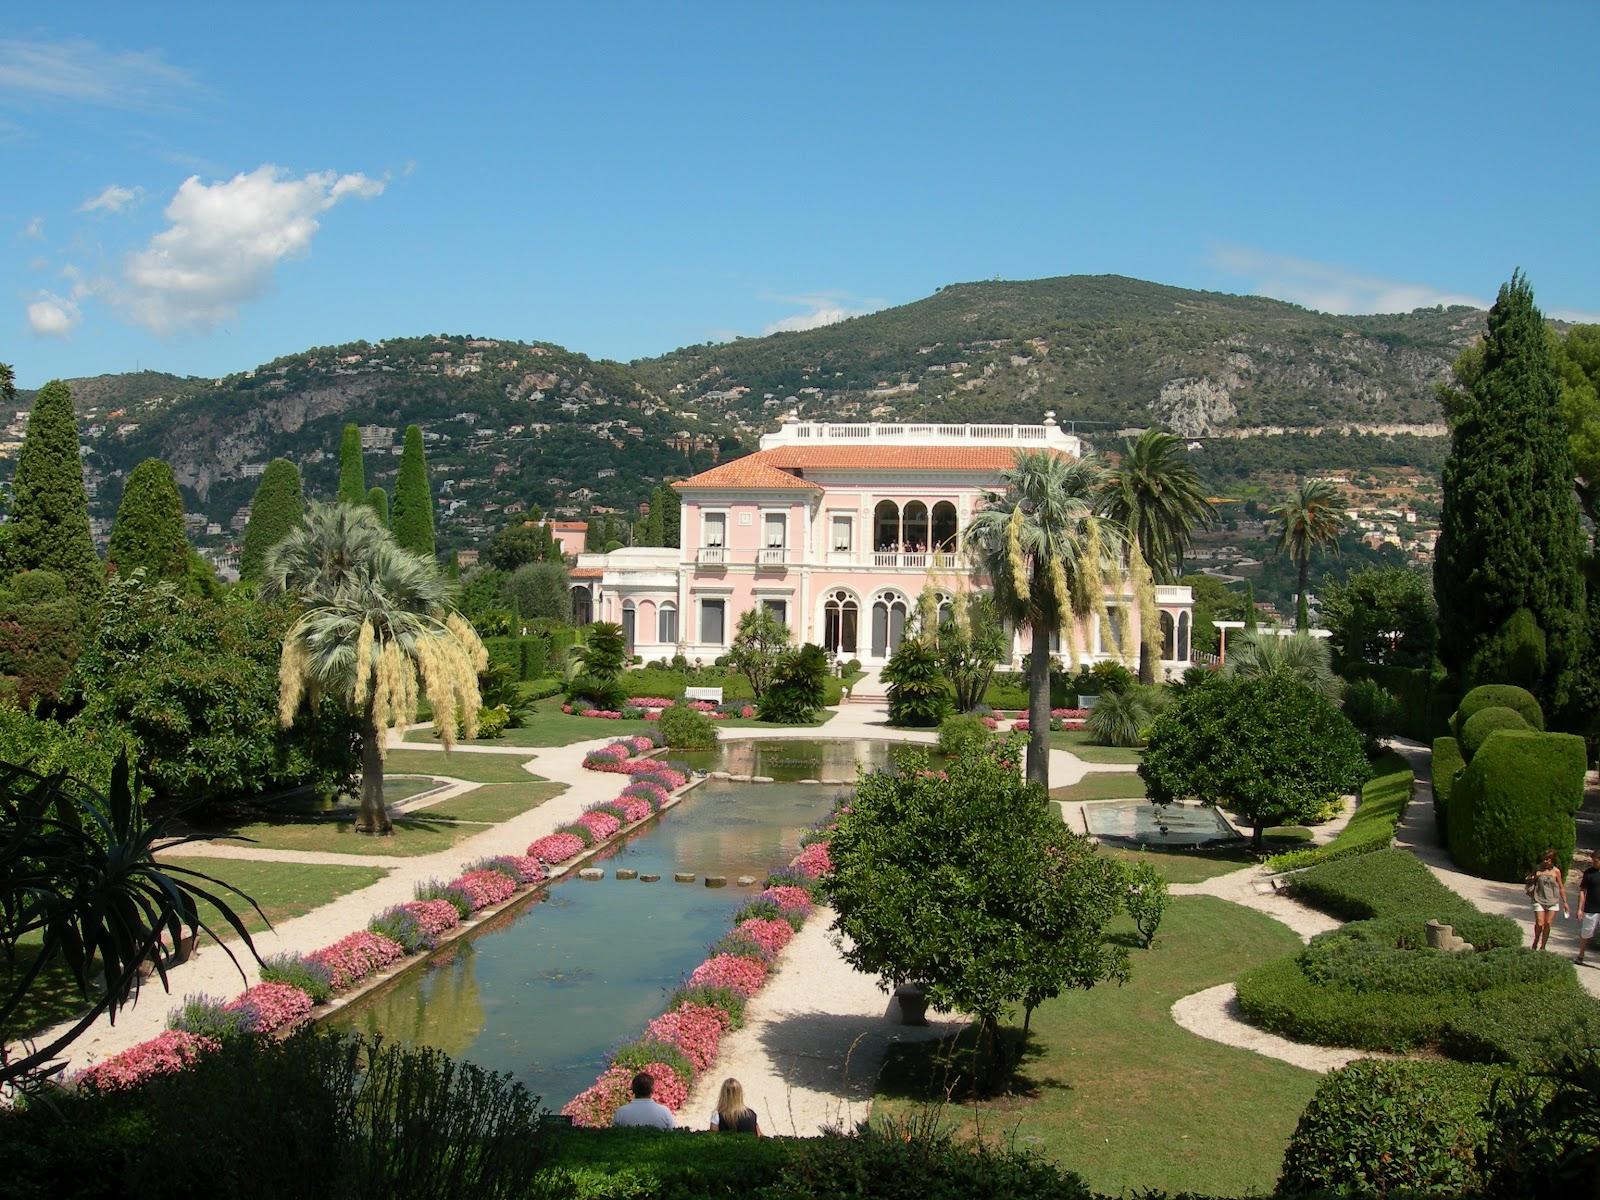 James Bond Locations: Villa Ephrussi de Rothschild / Palmyra - part 1